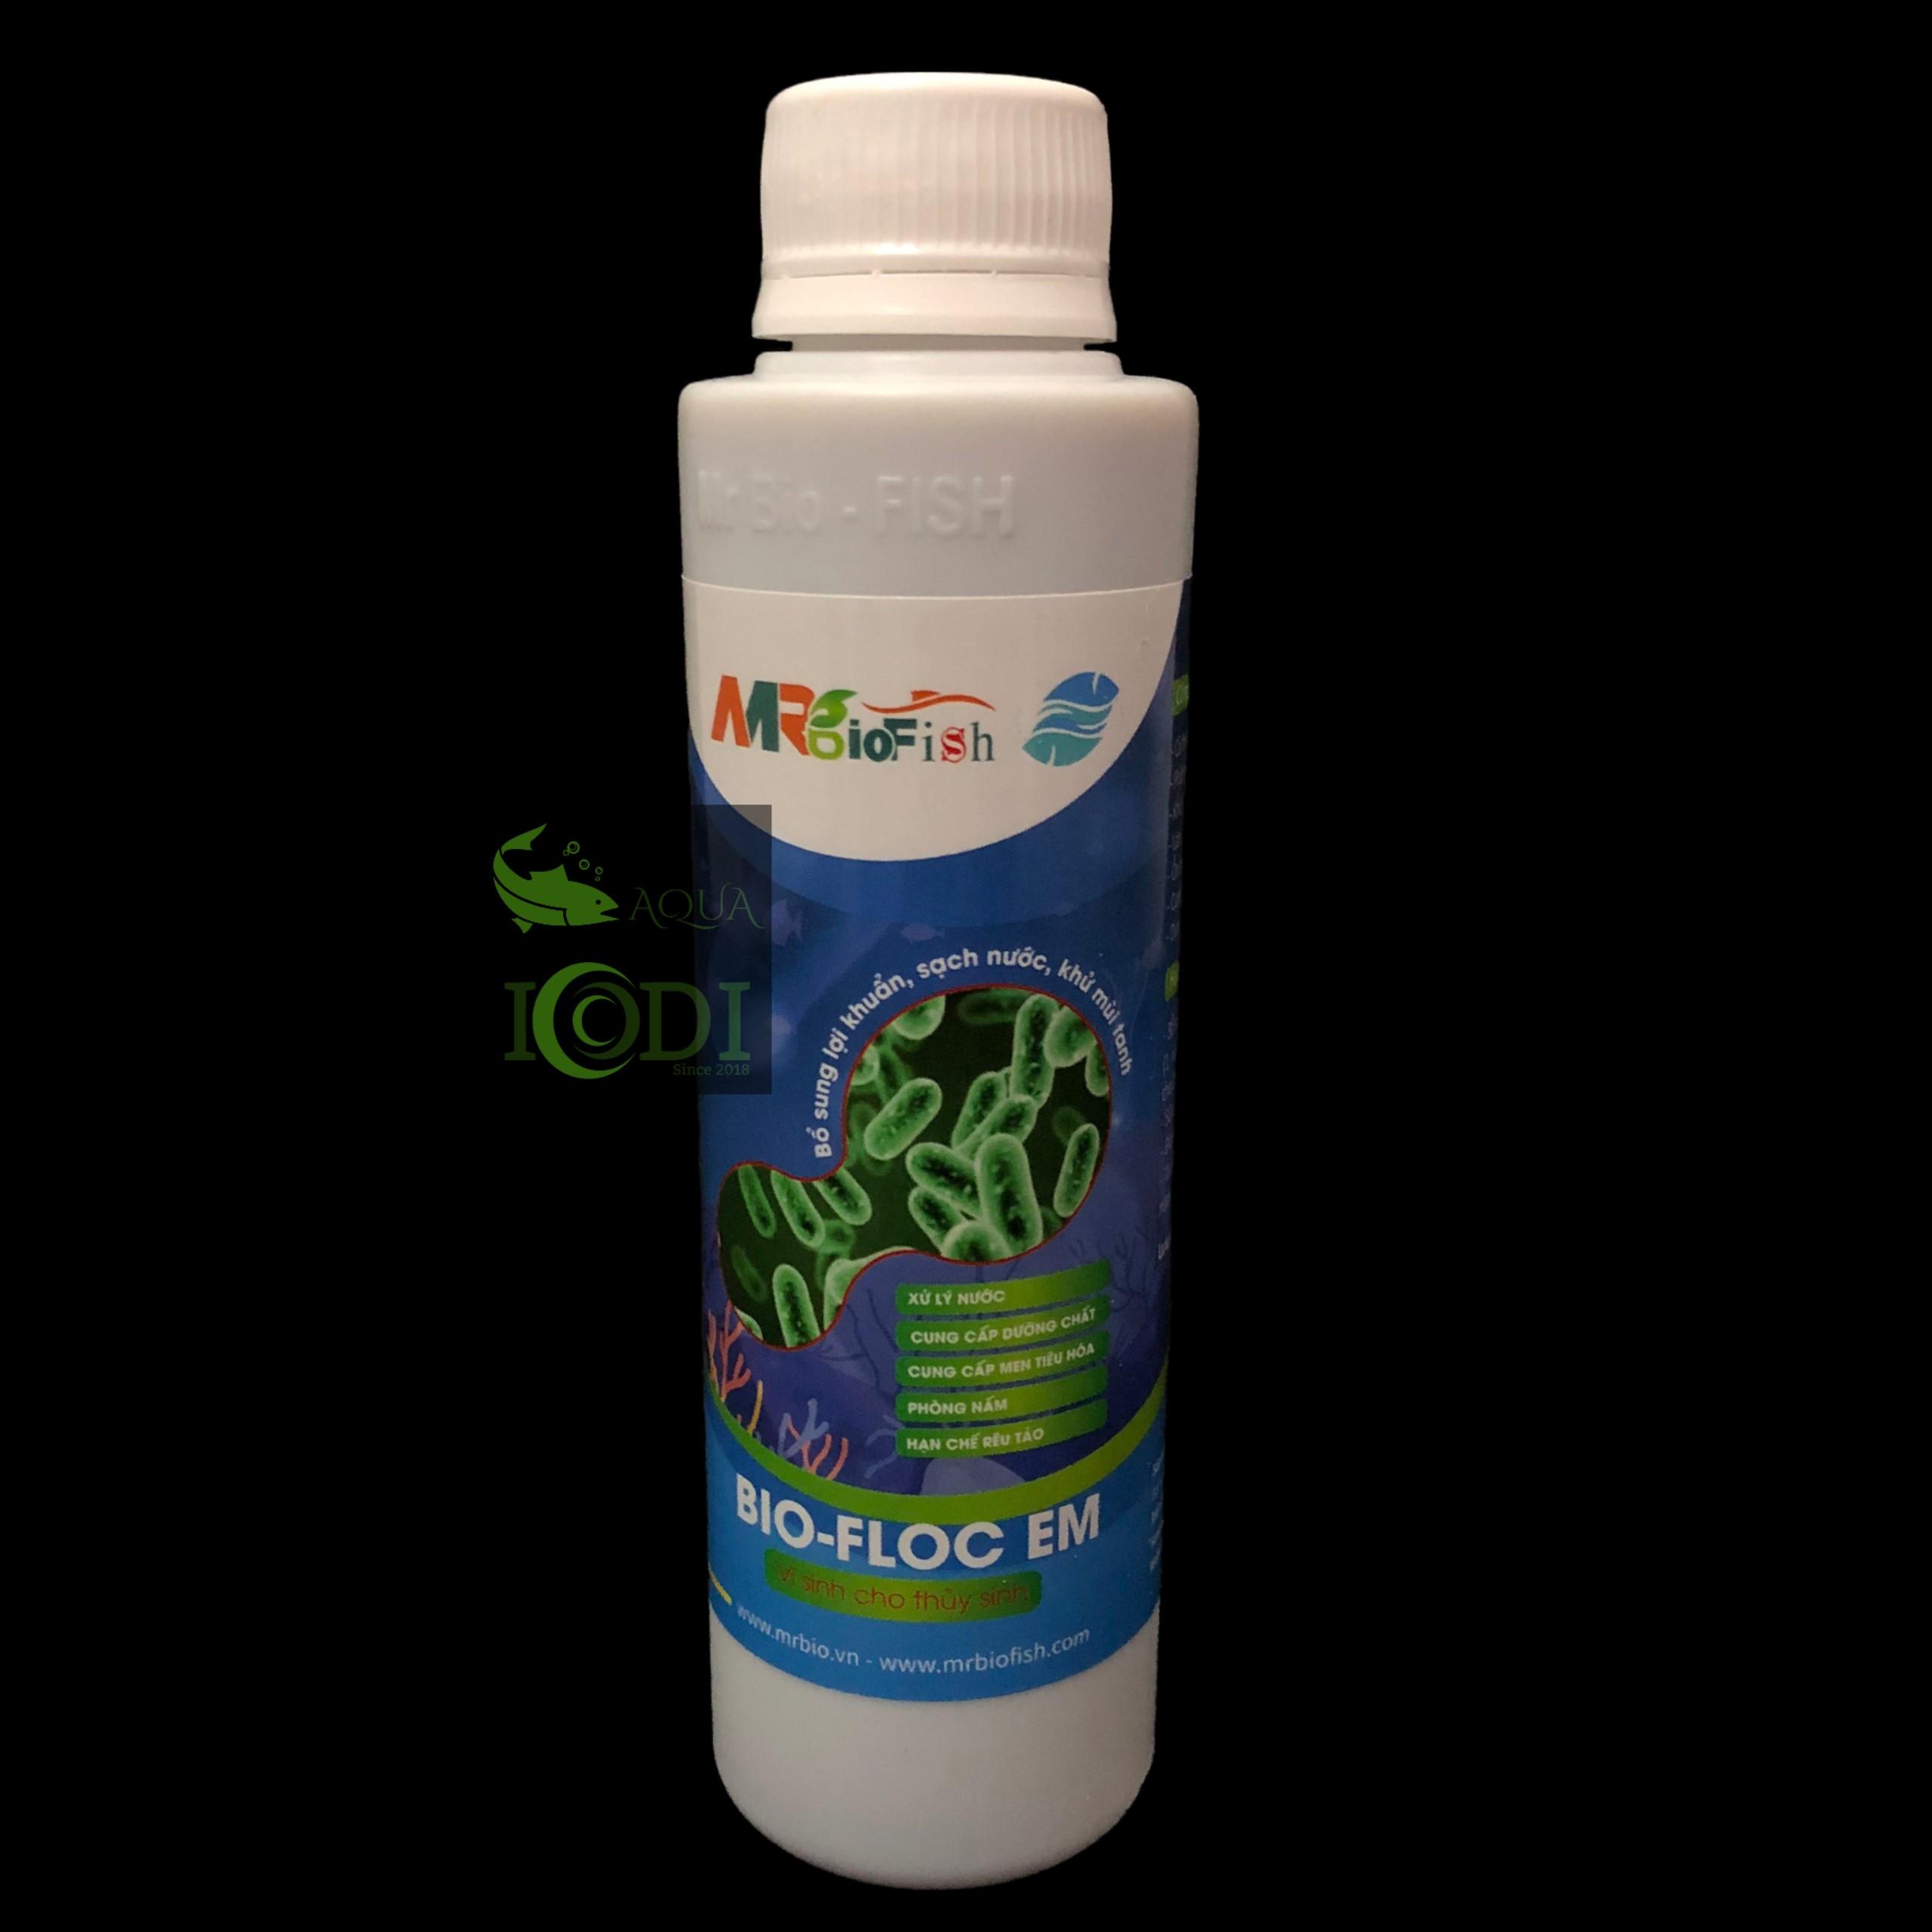 mrbiofish-men-vi-sinh-cho-thuy-sinh-bio-floc-em